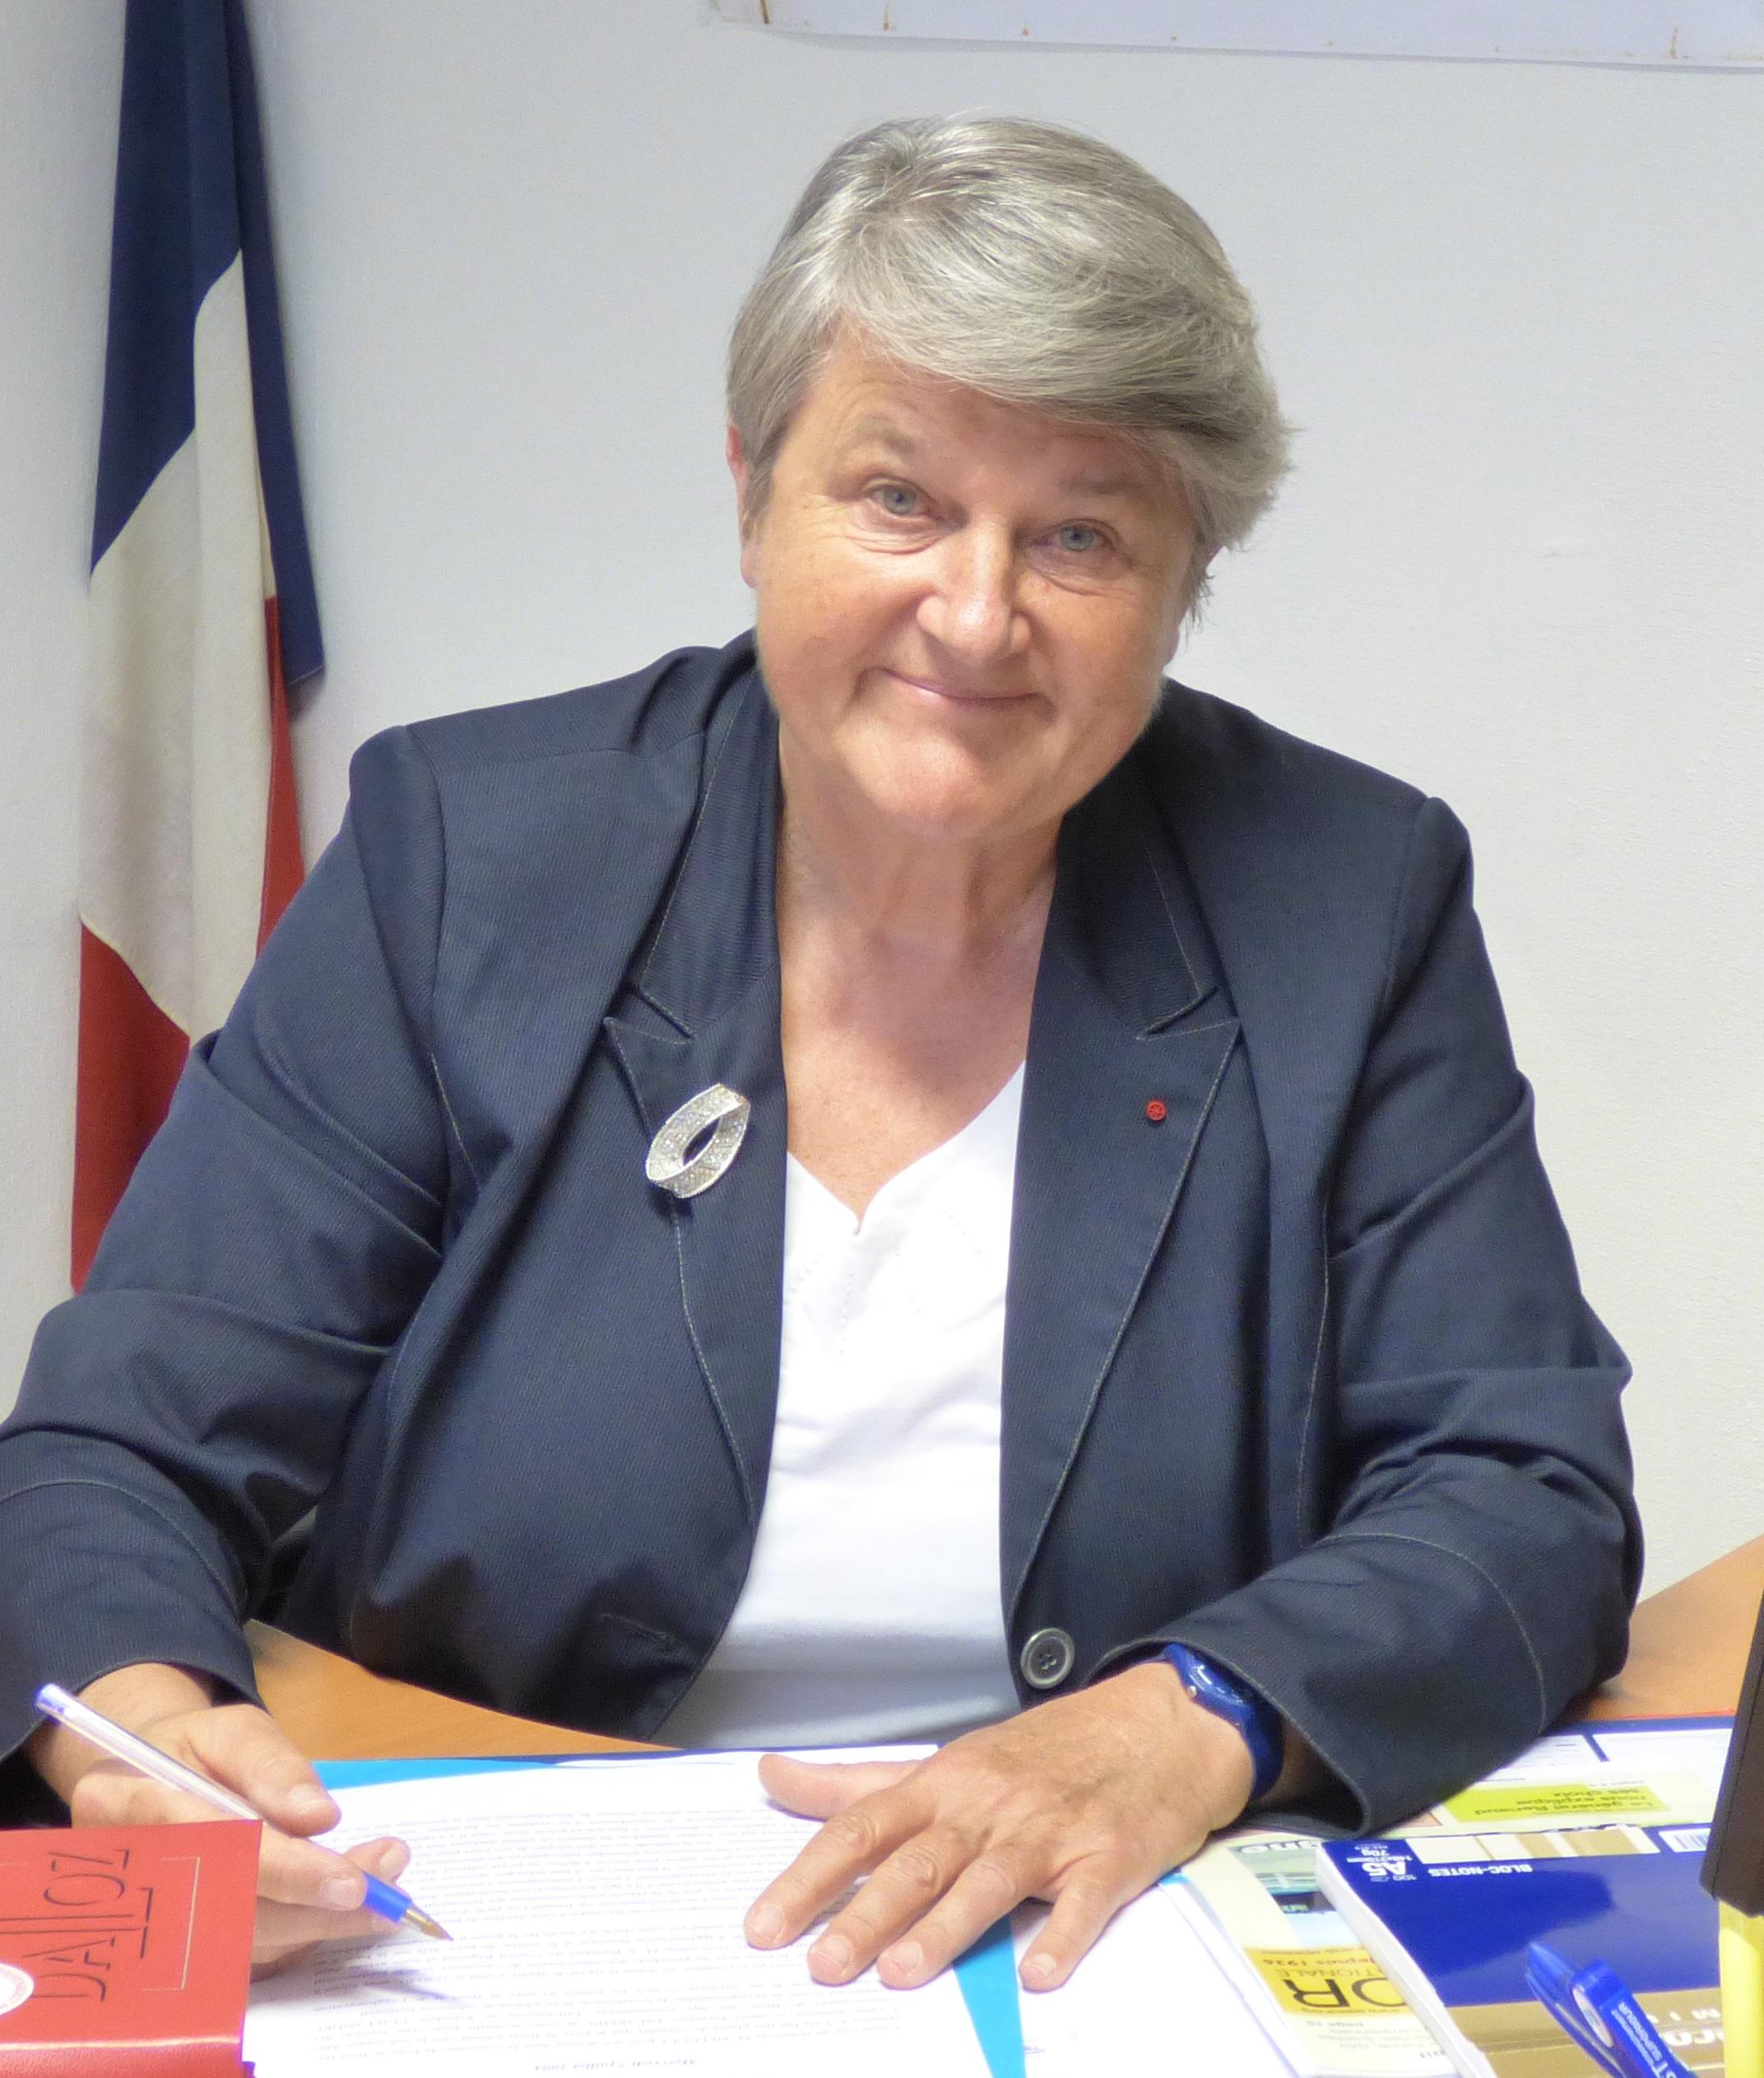 Bernadette Malgorn conseil métropole 14 octobre 2016